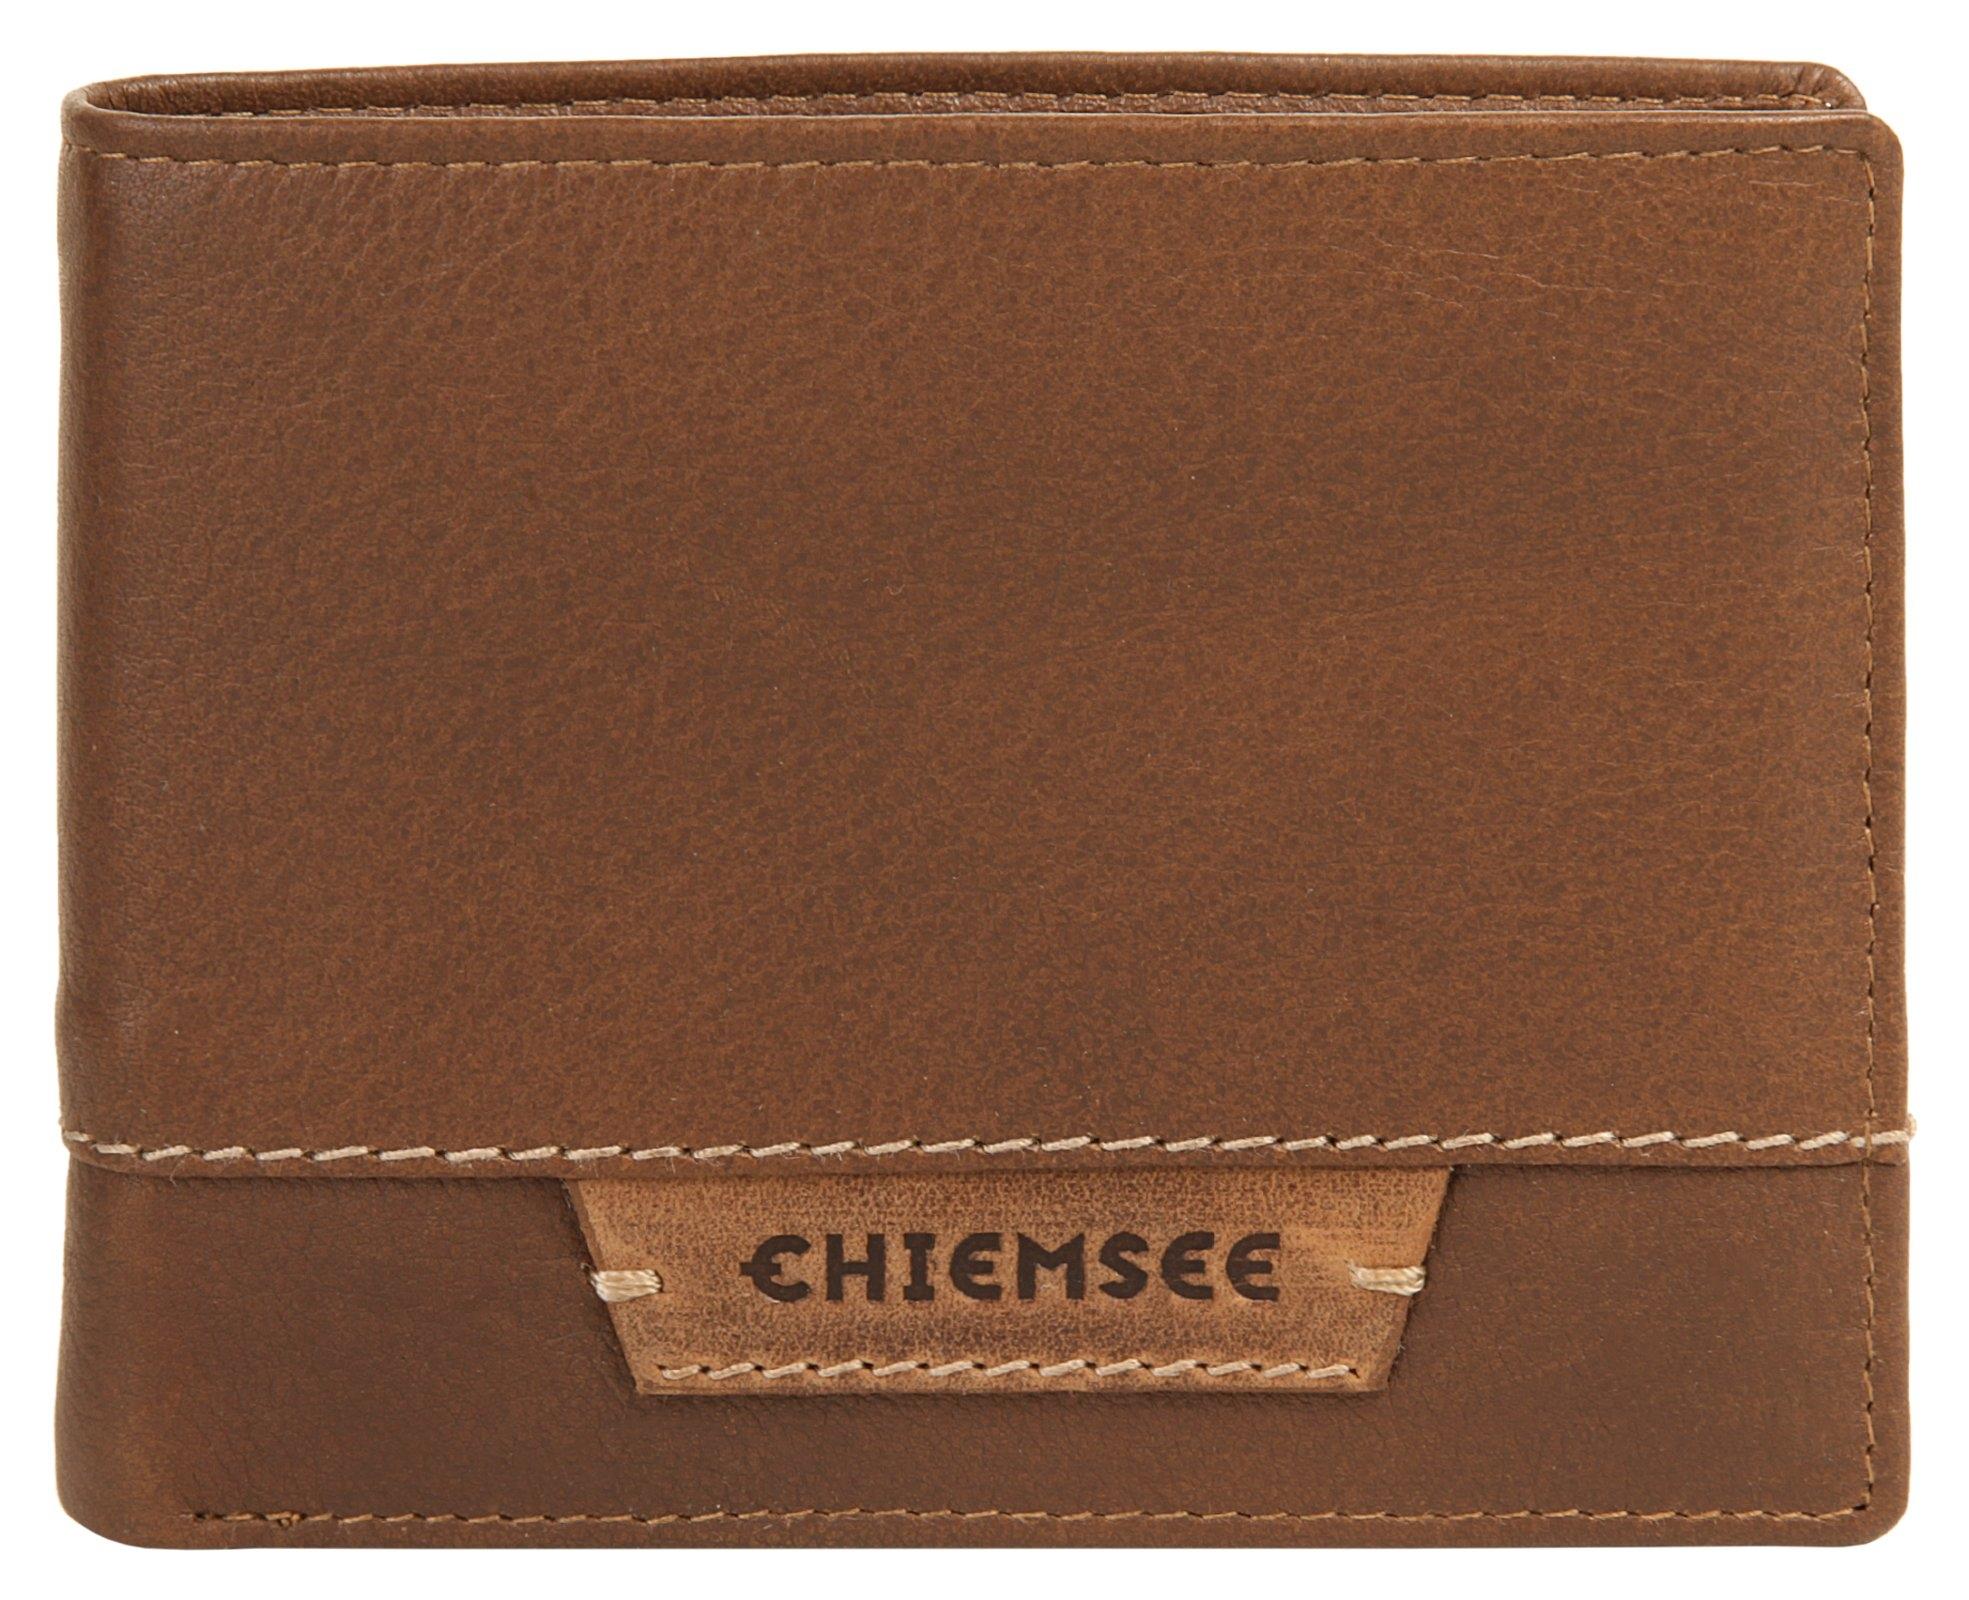 CHIEMSEE portemonnee »PARAGUAY« - verschillende betaalmethodes